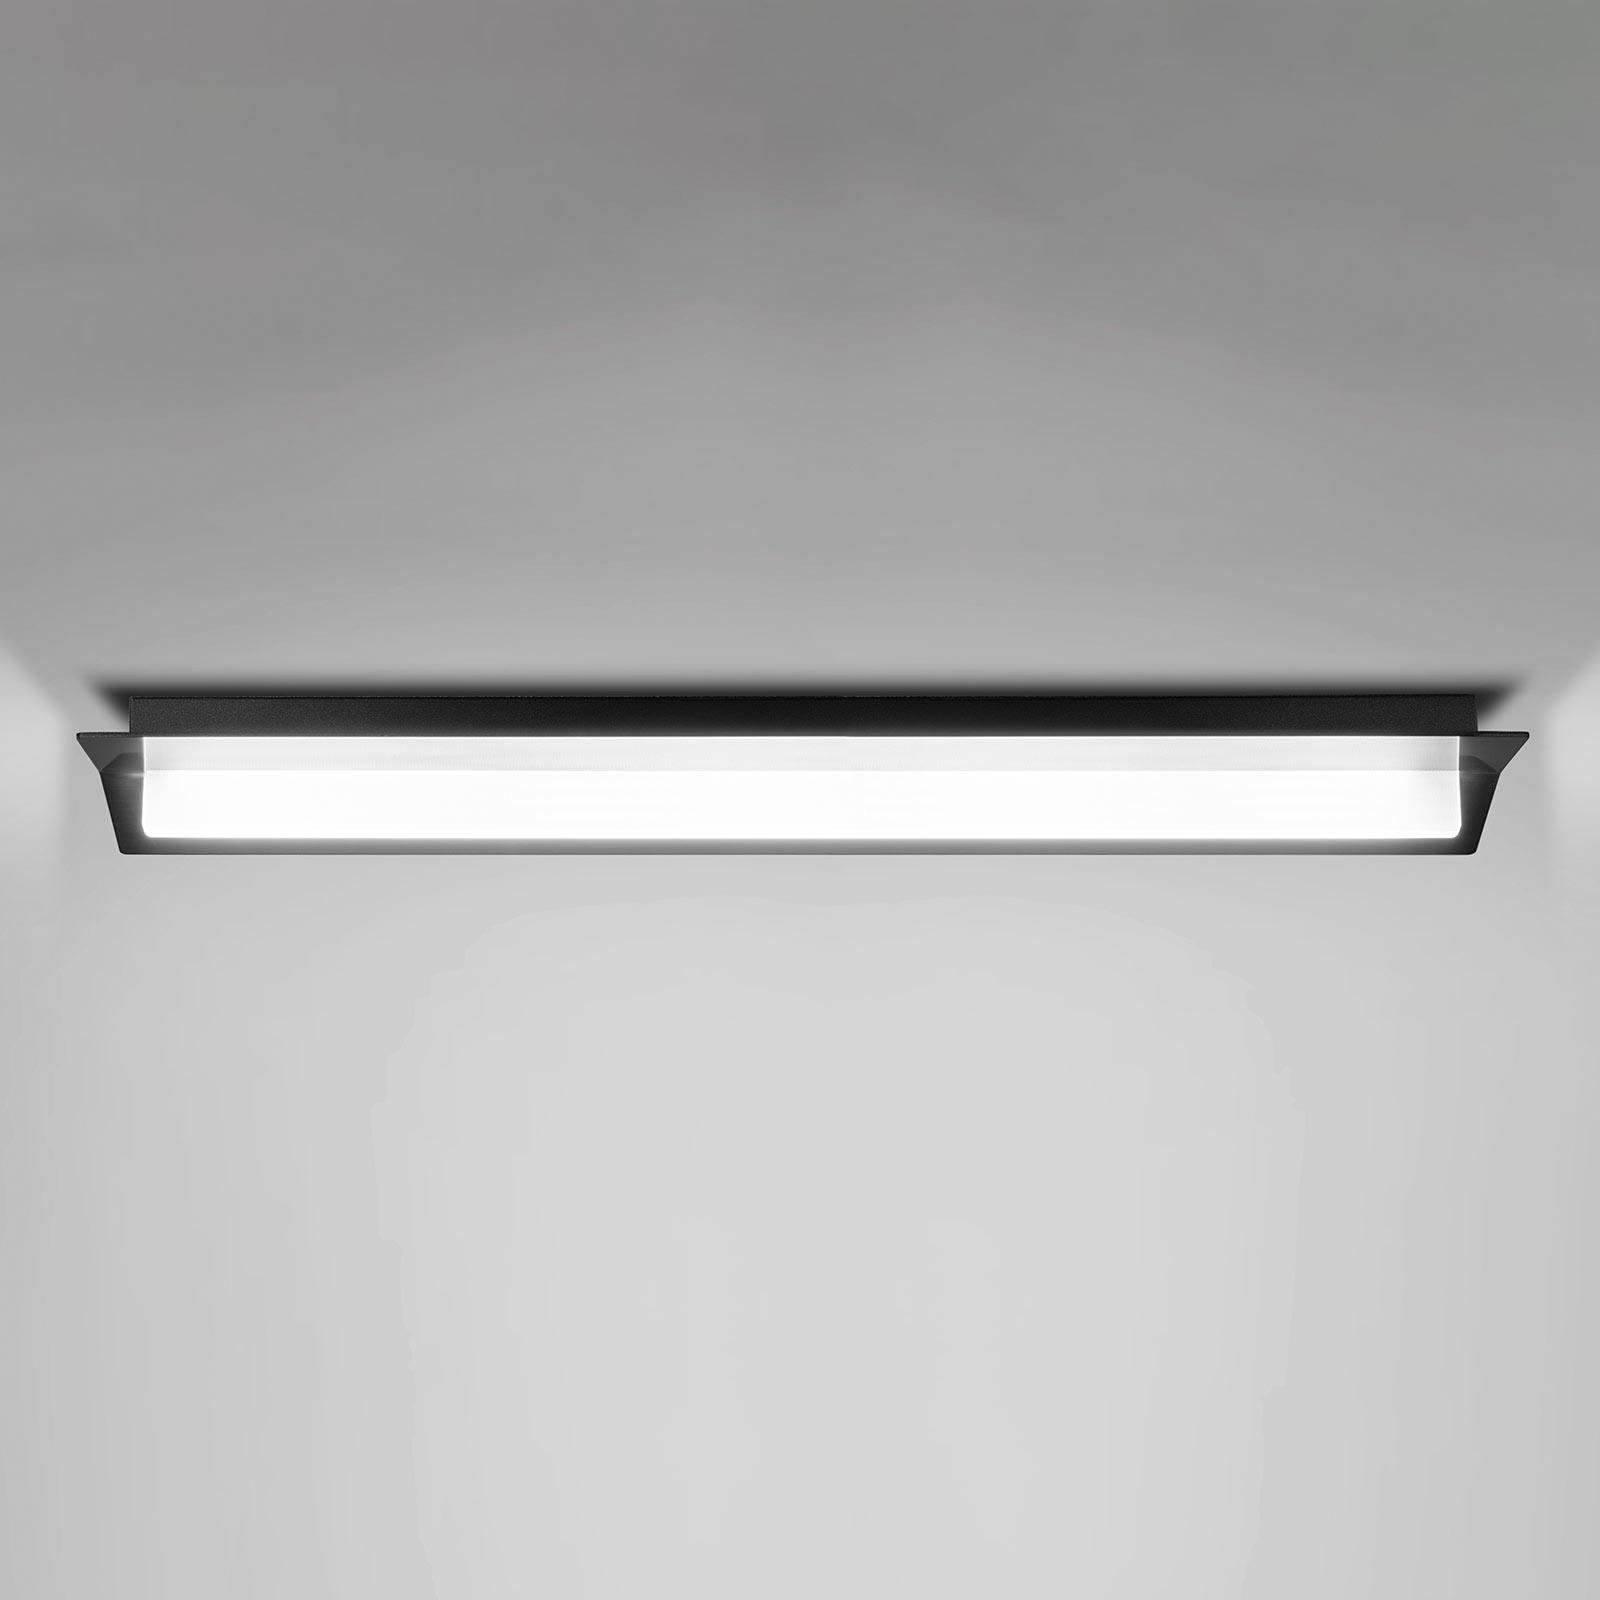 Lampa sufitowa LED Flurry, 70 cm, czarna